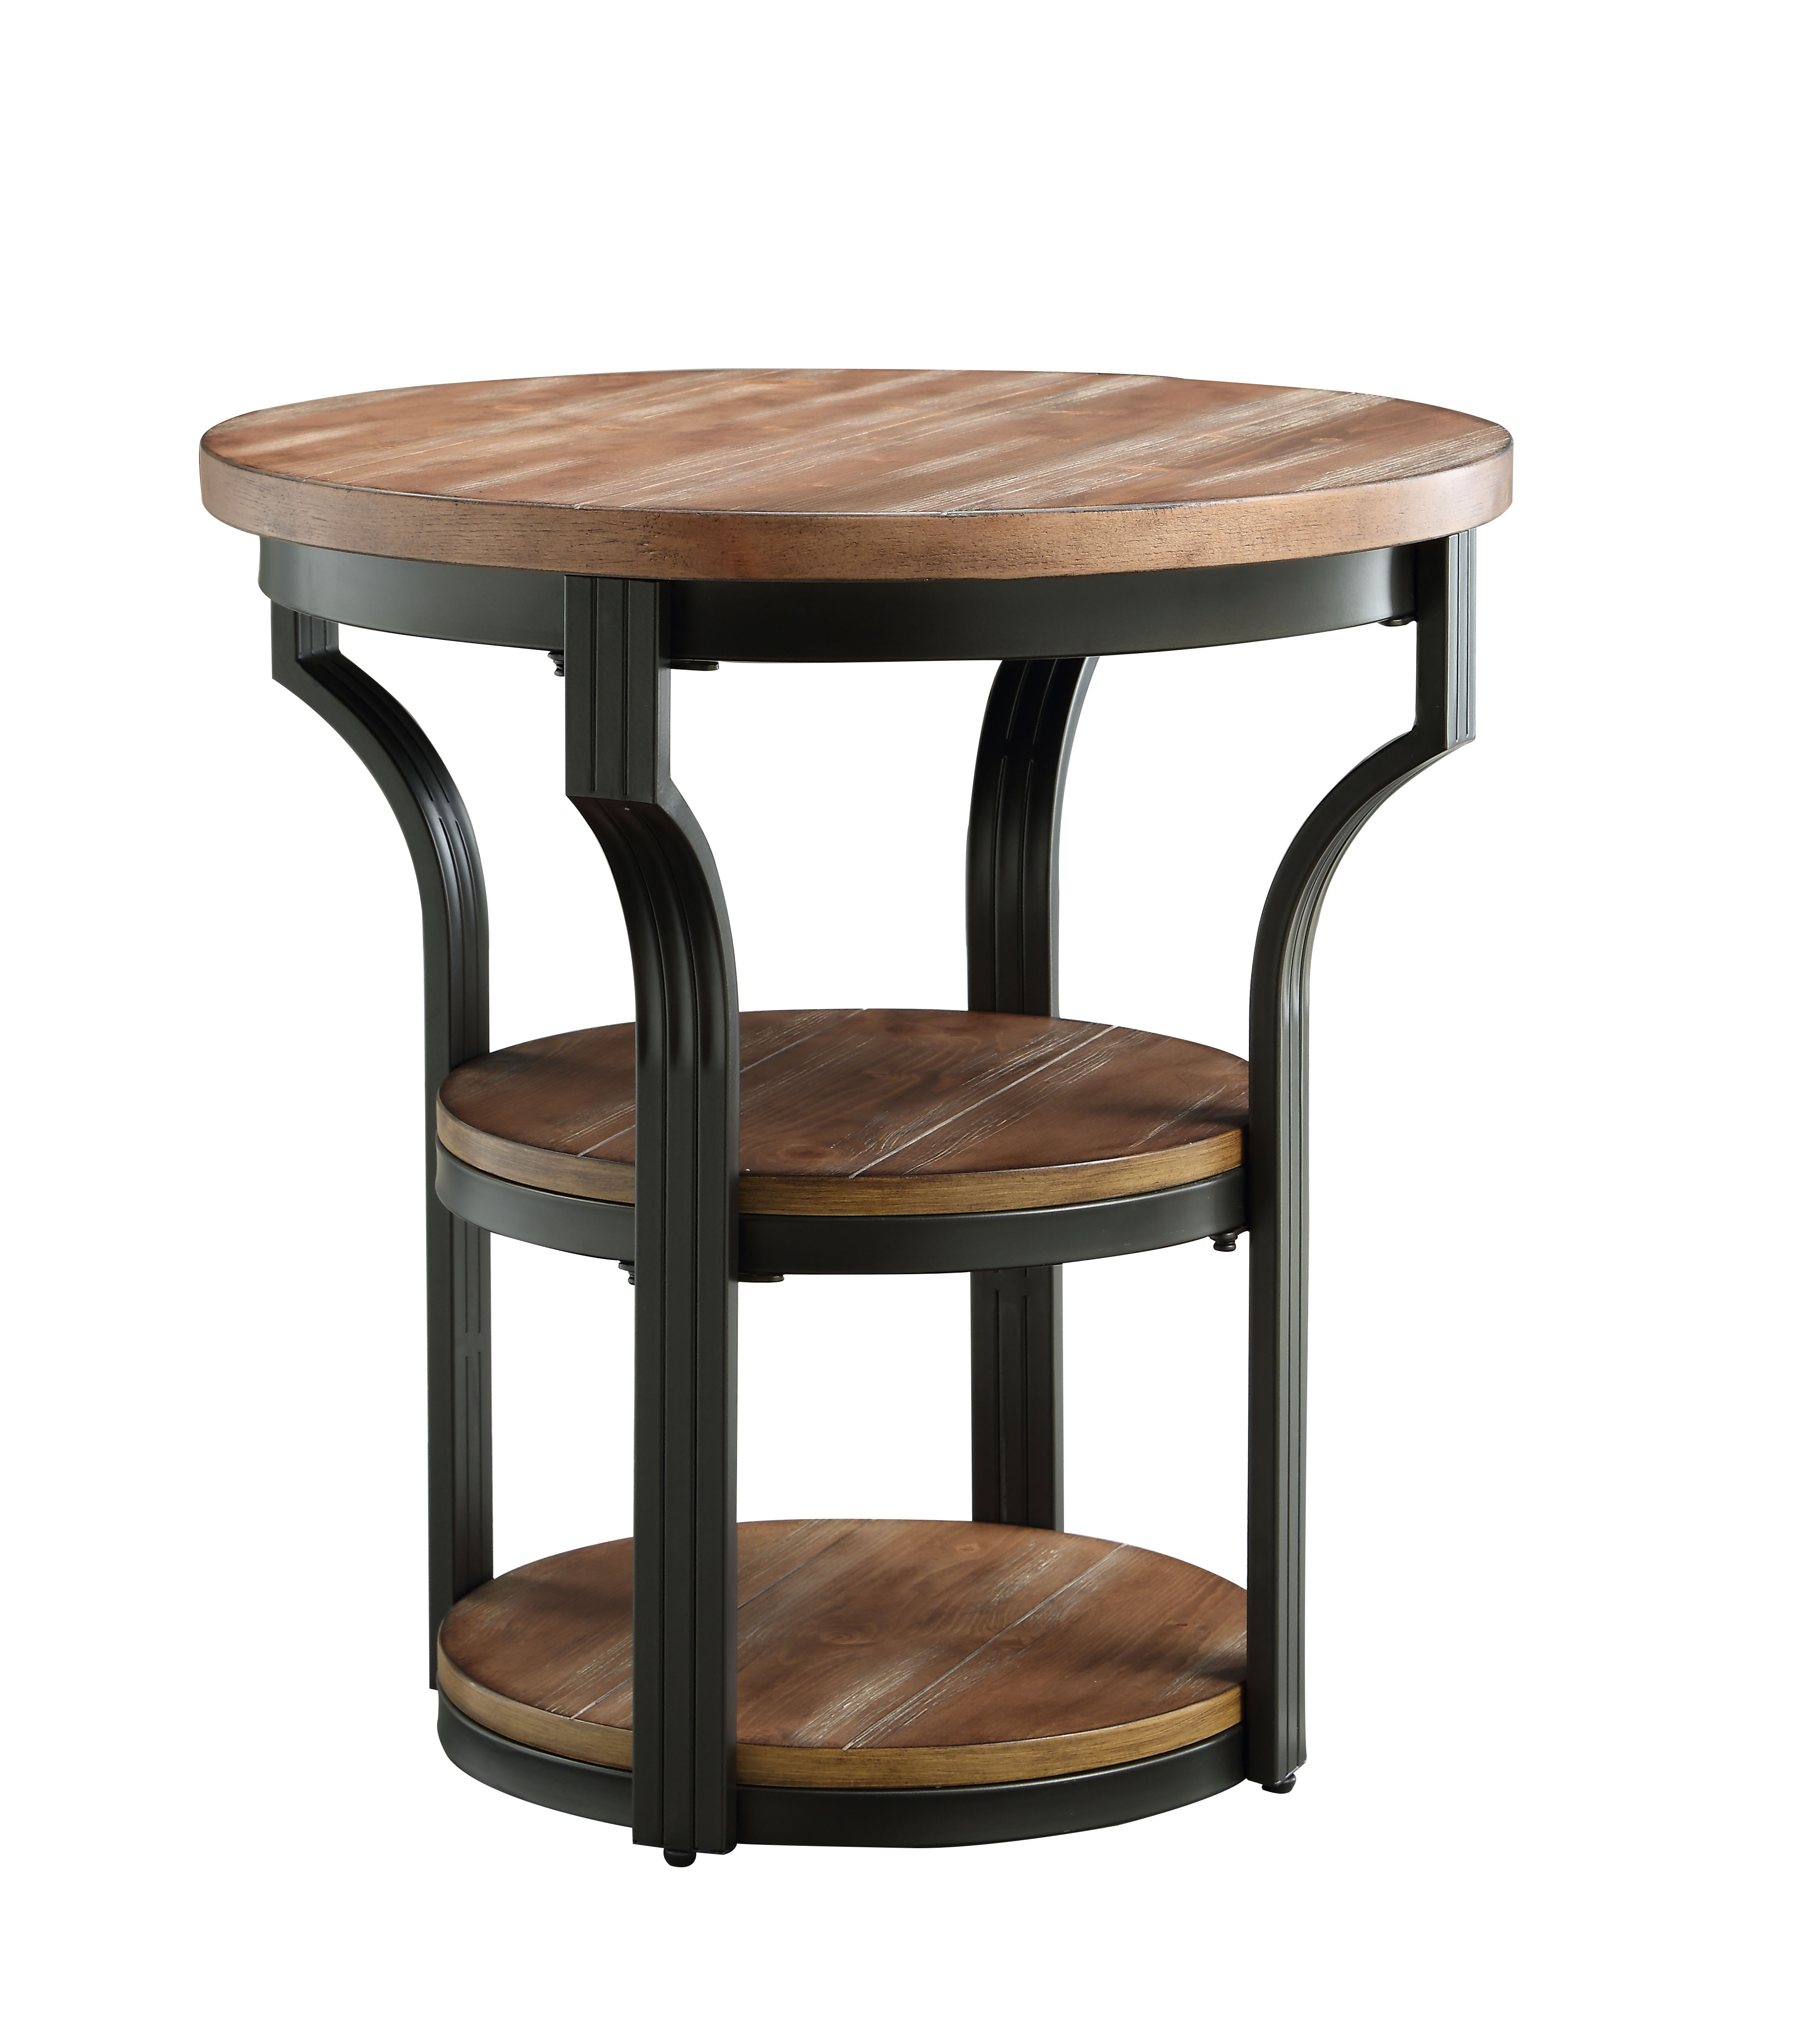 ACME Geoff End Table (2 Shelves), Oak & Black by Acme Furniture